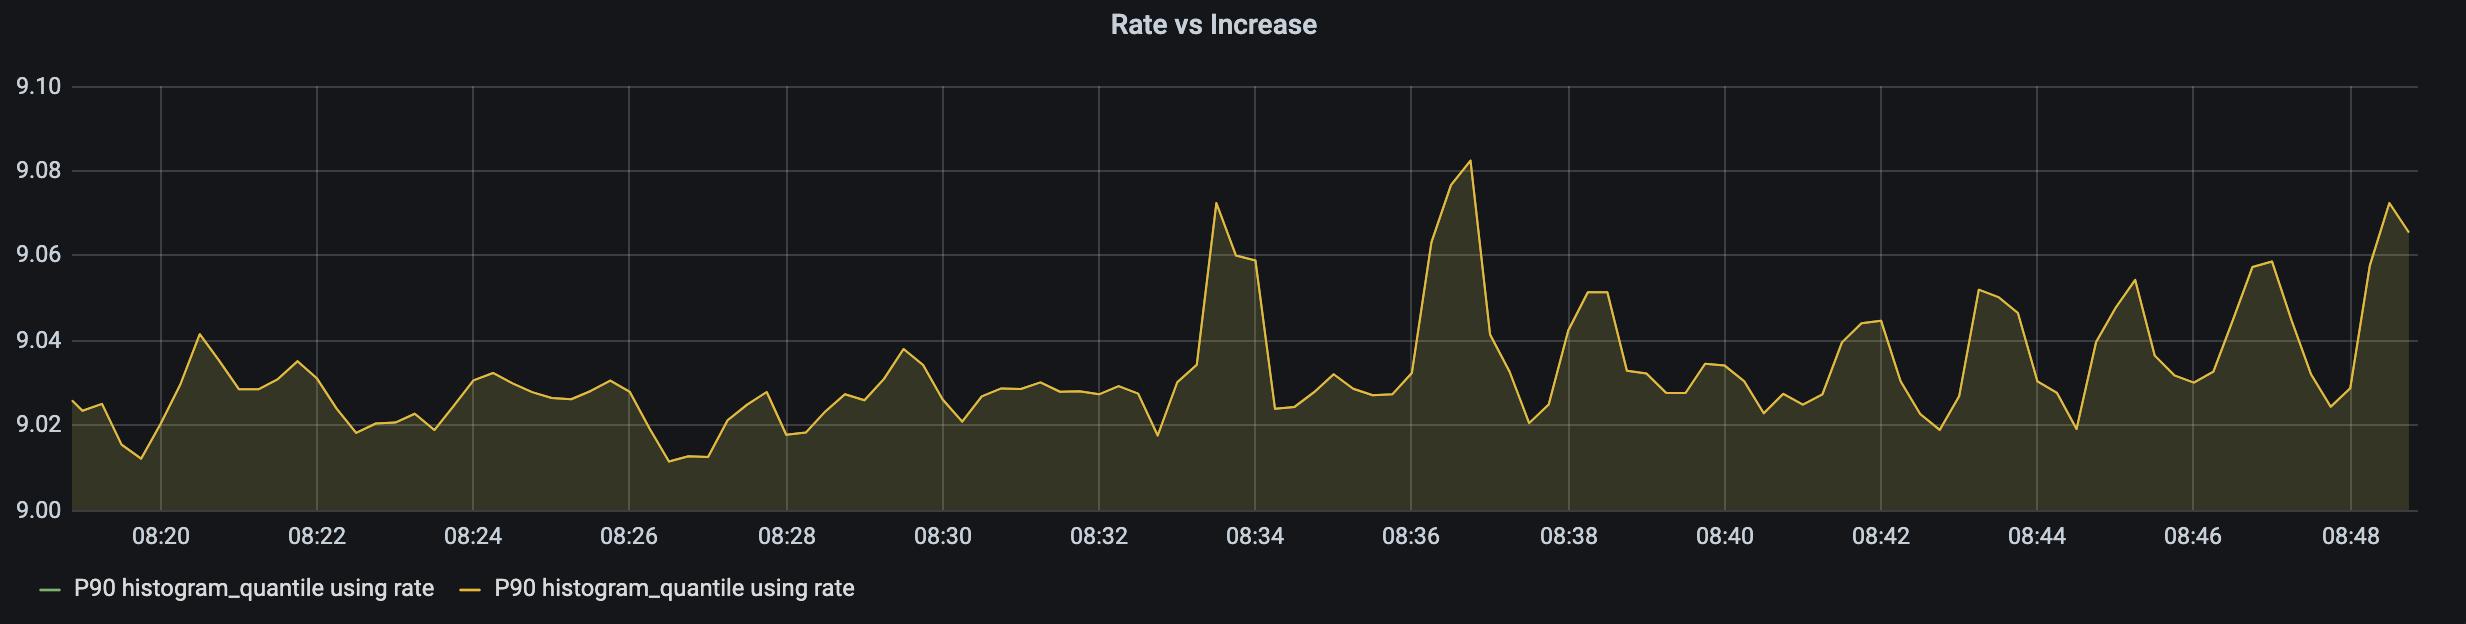 histogram_quantile rate vs increase